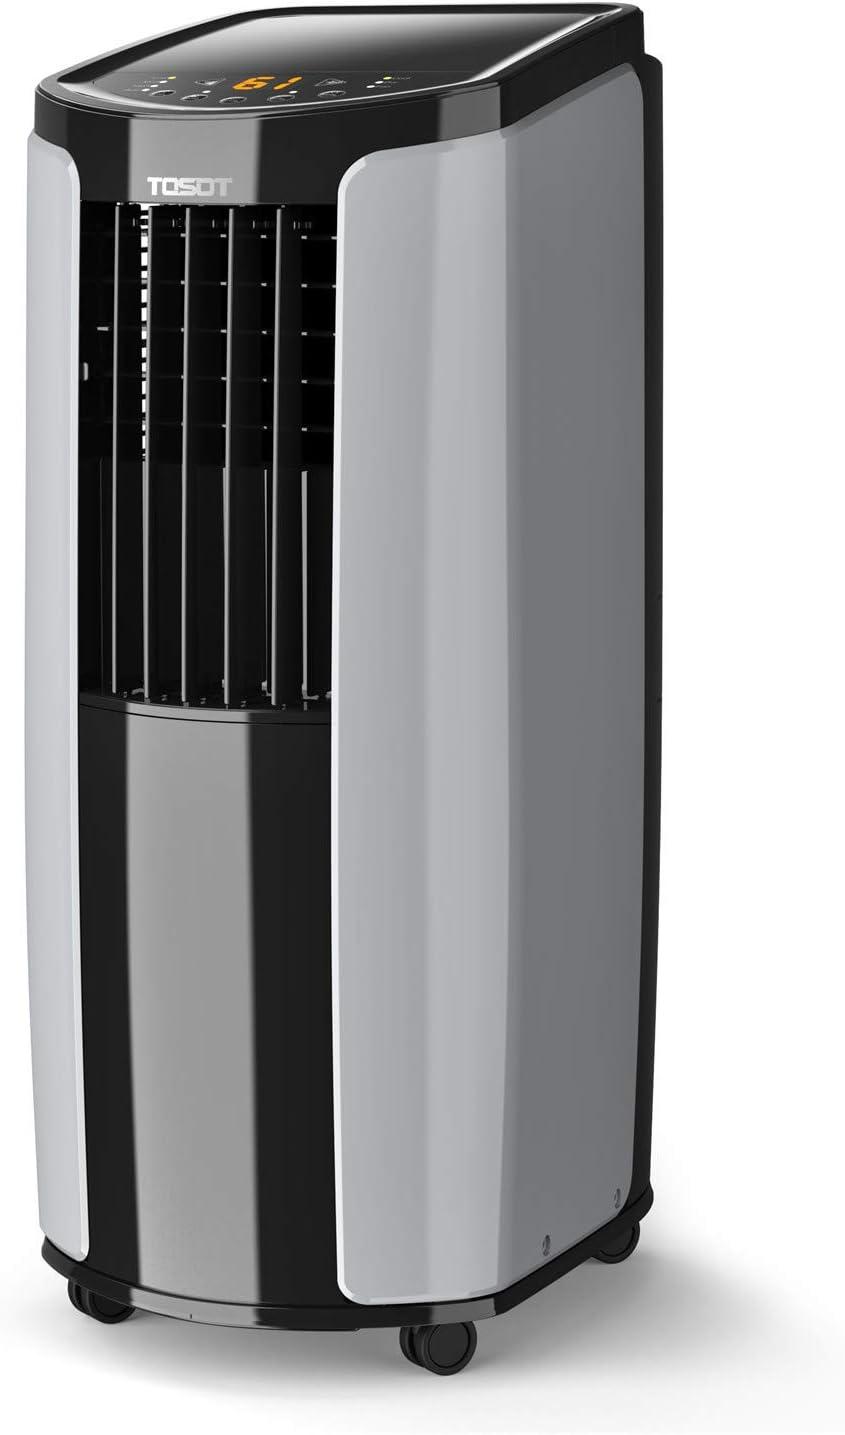 TOSOT 8,000 BTU Portable AC